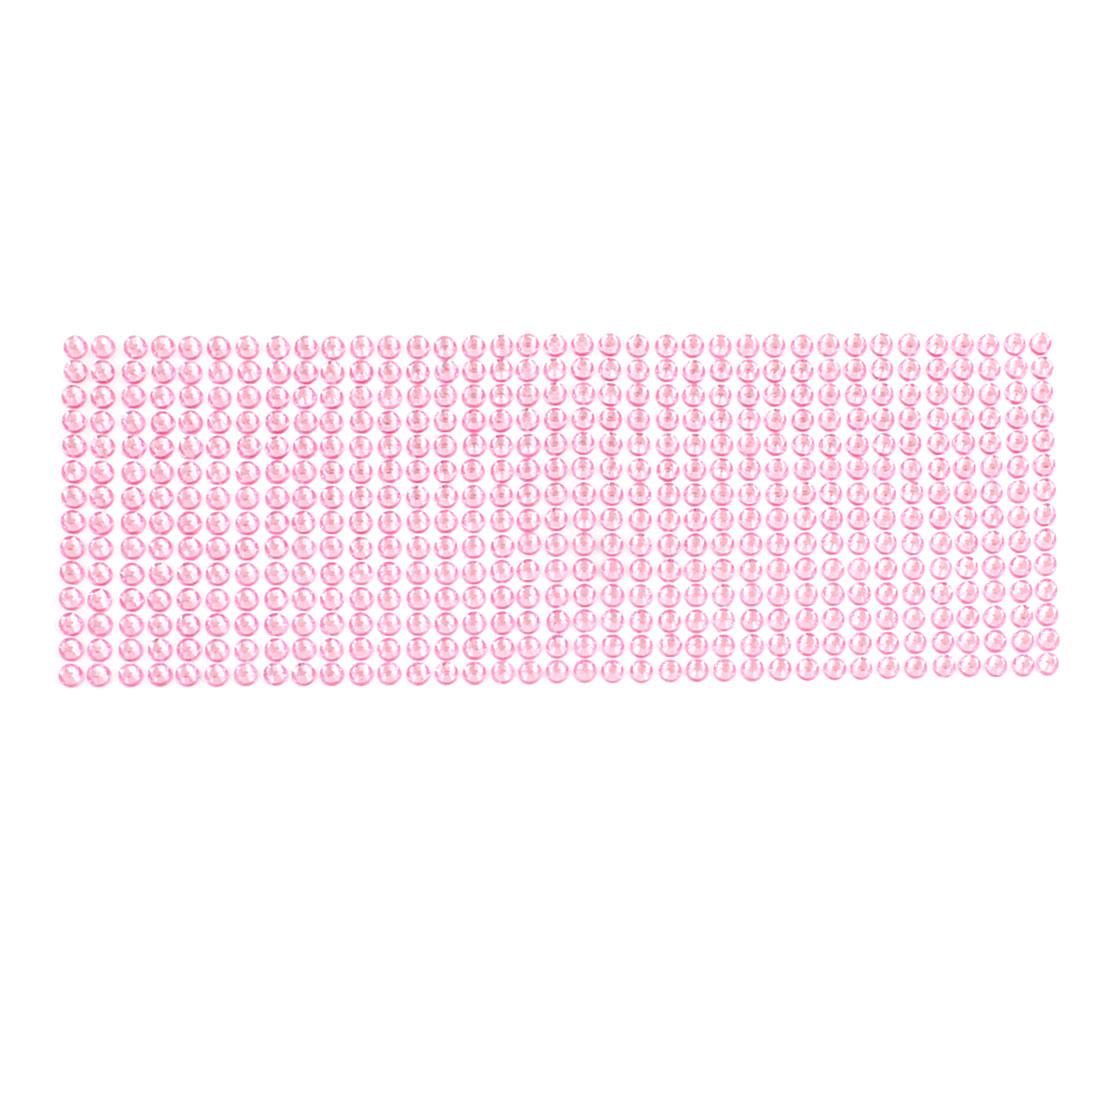 Car Pink 6mm Diameter Sparkling Rhinestones Detail DIY Stickers Decal Decoration